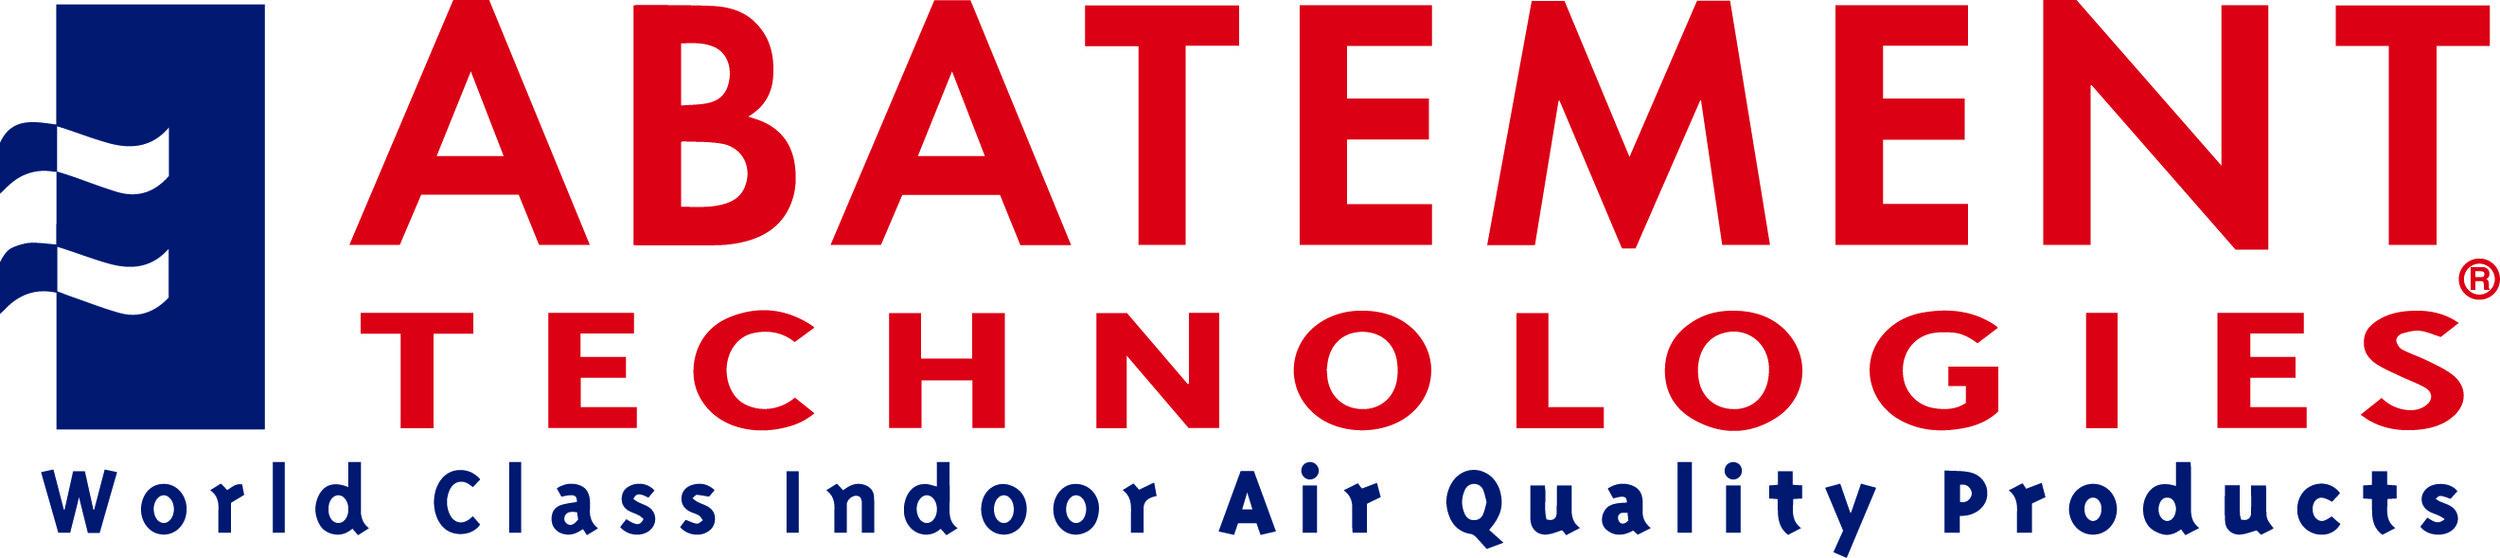 Abatement Technologies - logo w tagline.jpg